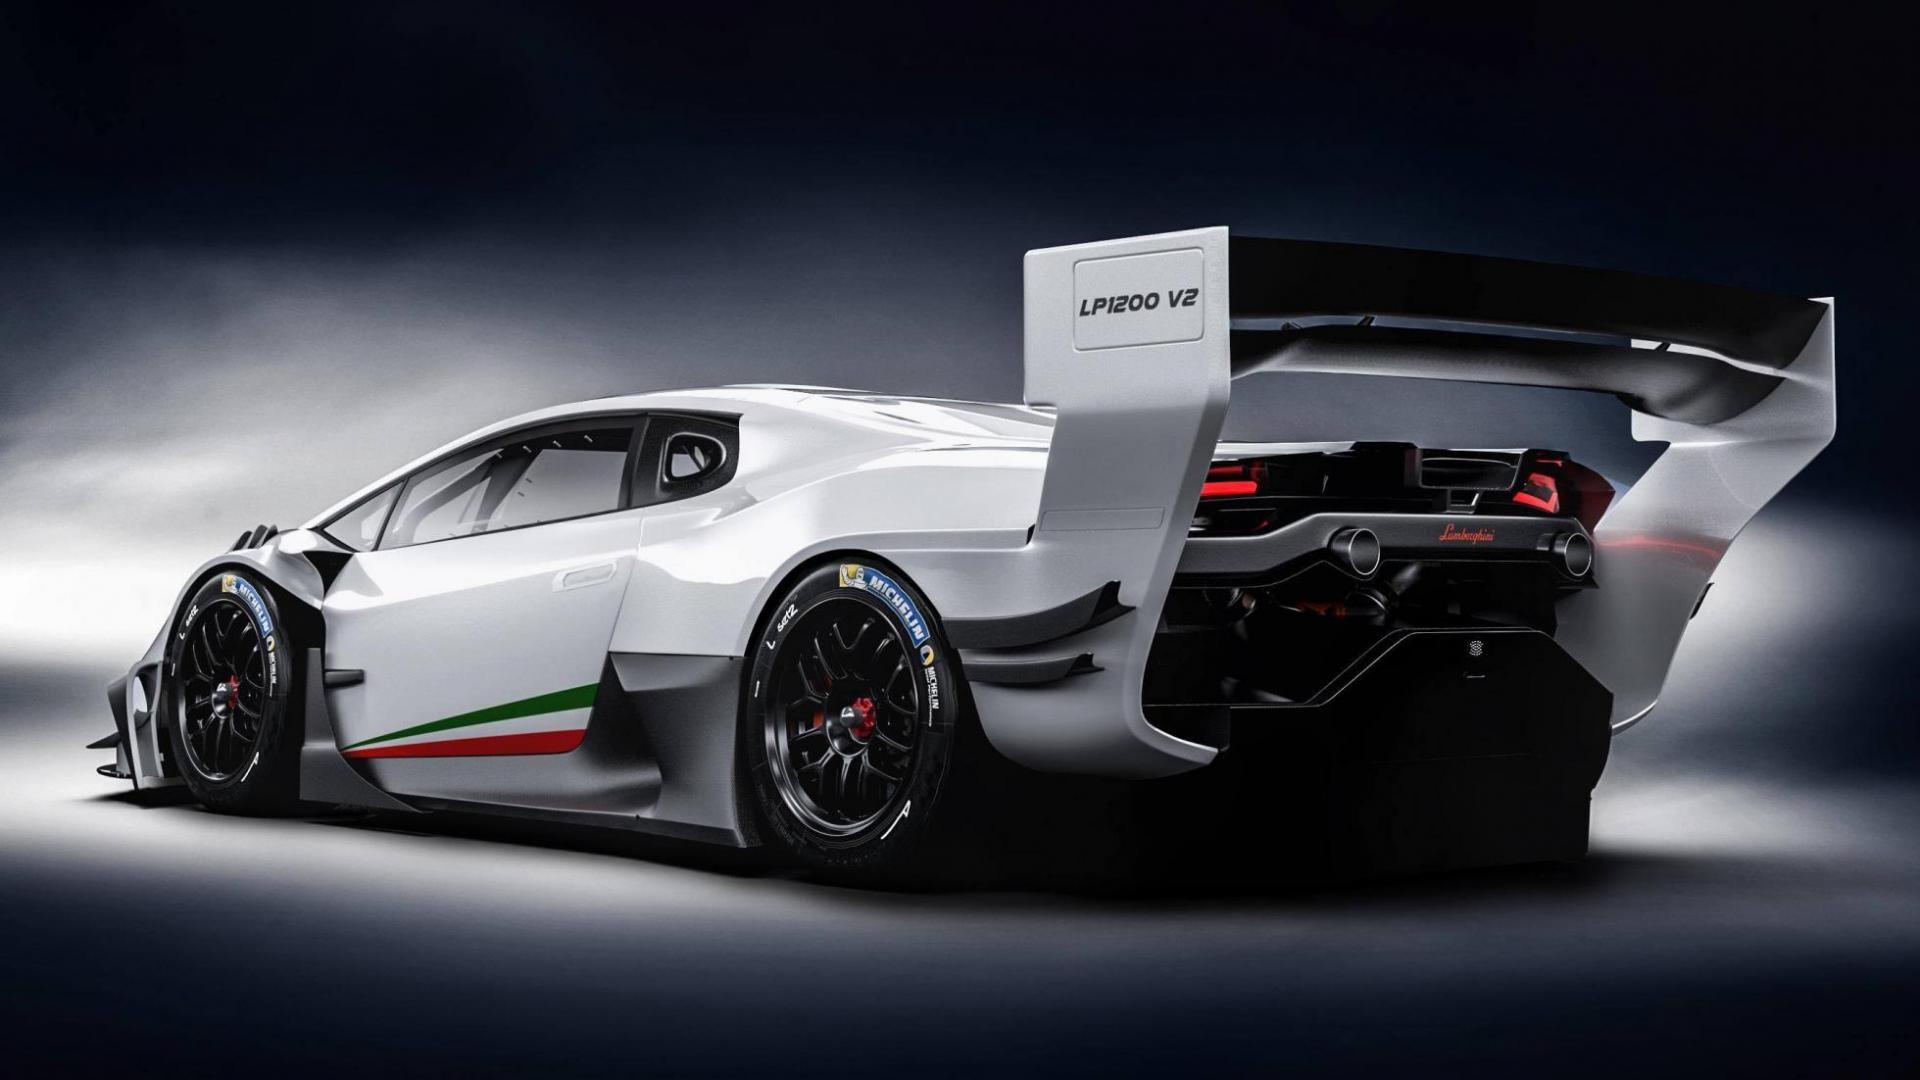 Zyrus LP1200 Strada (Lamborghini Huracan Super Trofeo)